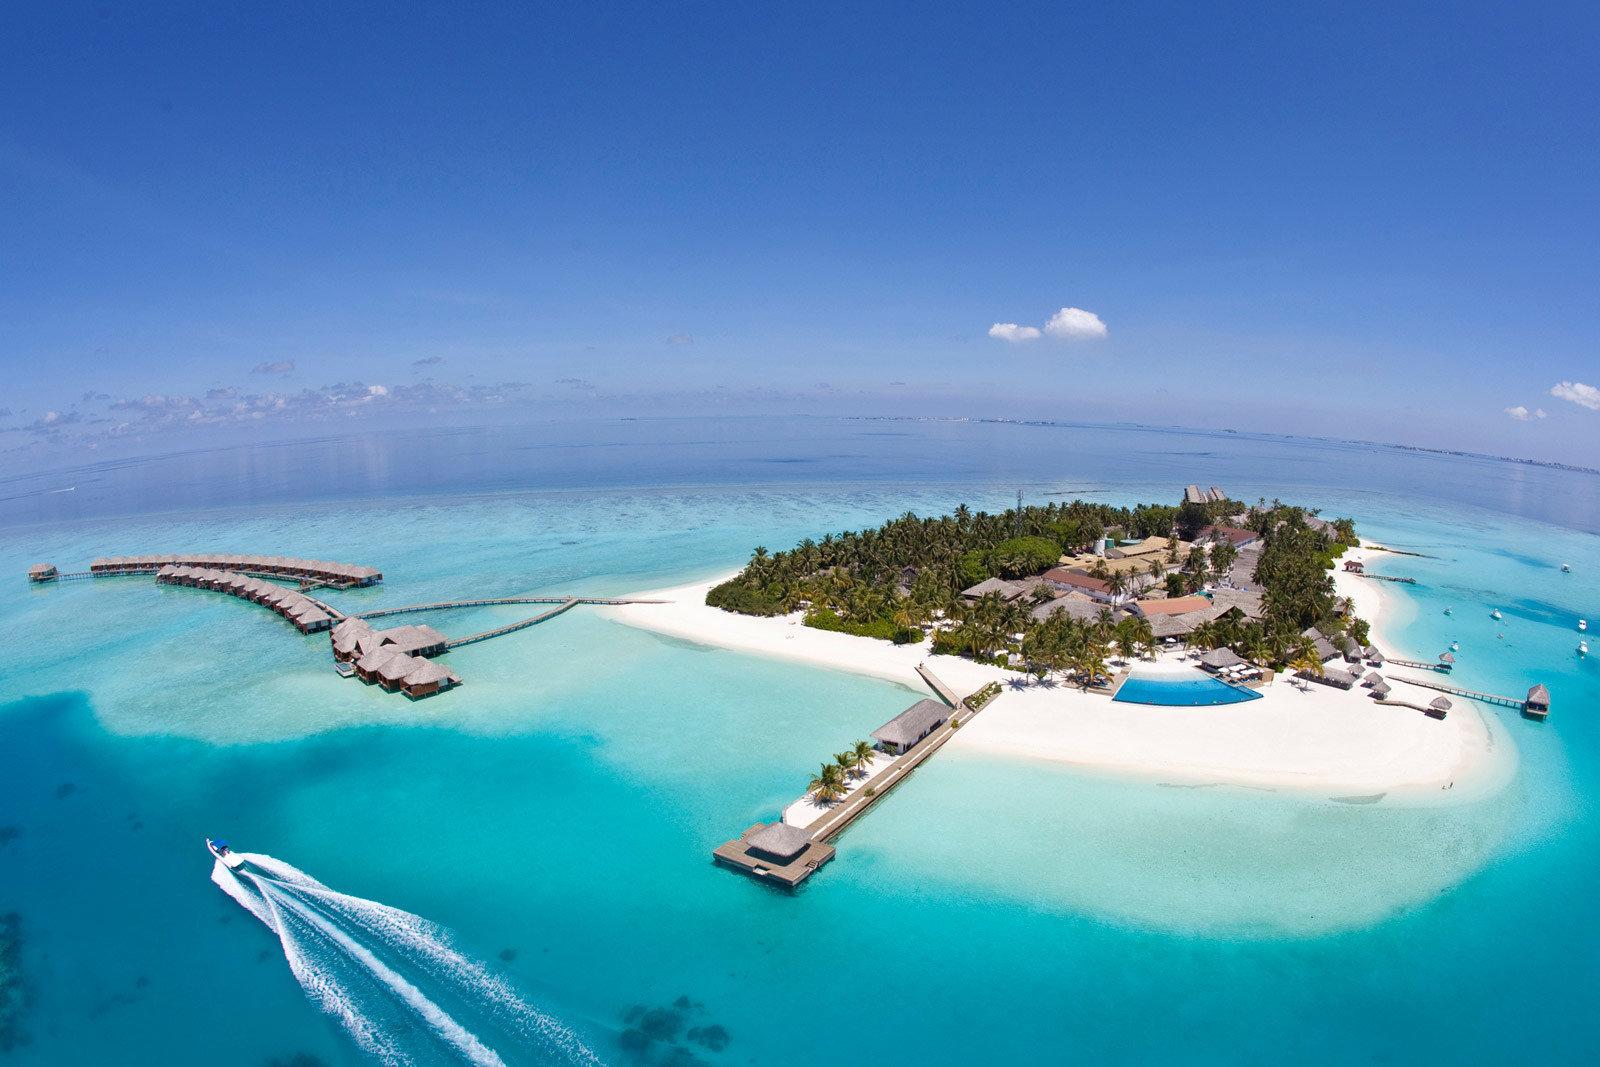 water sky Nature Sea Ocean caribbean swimming pool Lake Coast archipelago Island cape Lagoon islet Beach Resort atoll reef blue shore